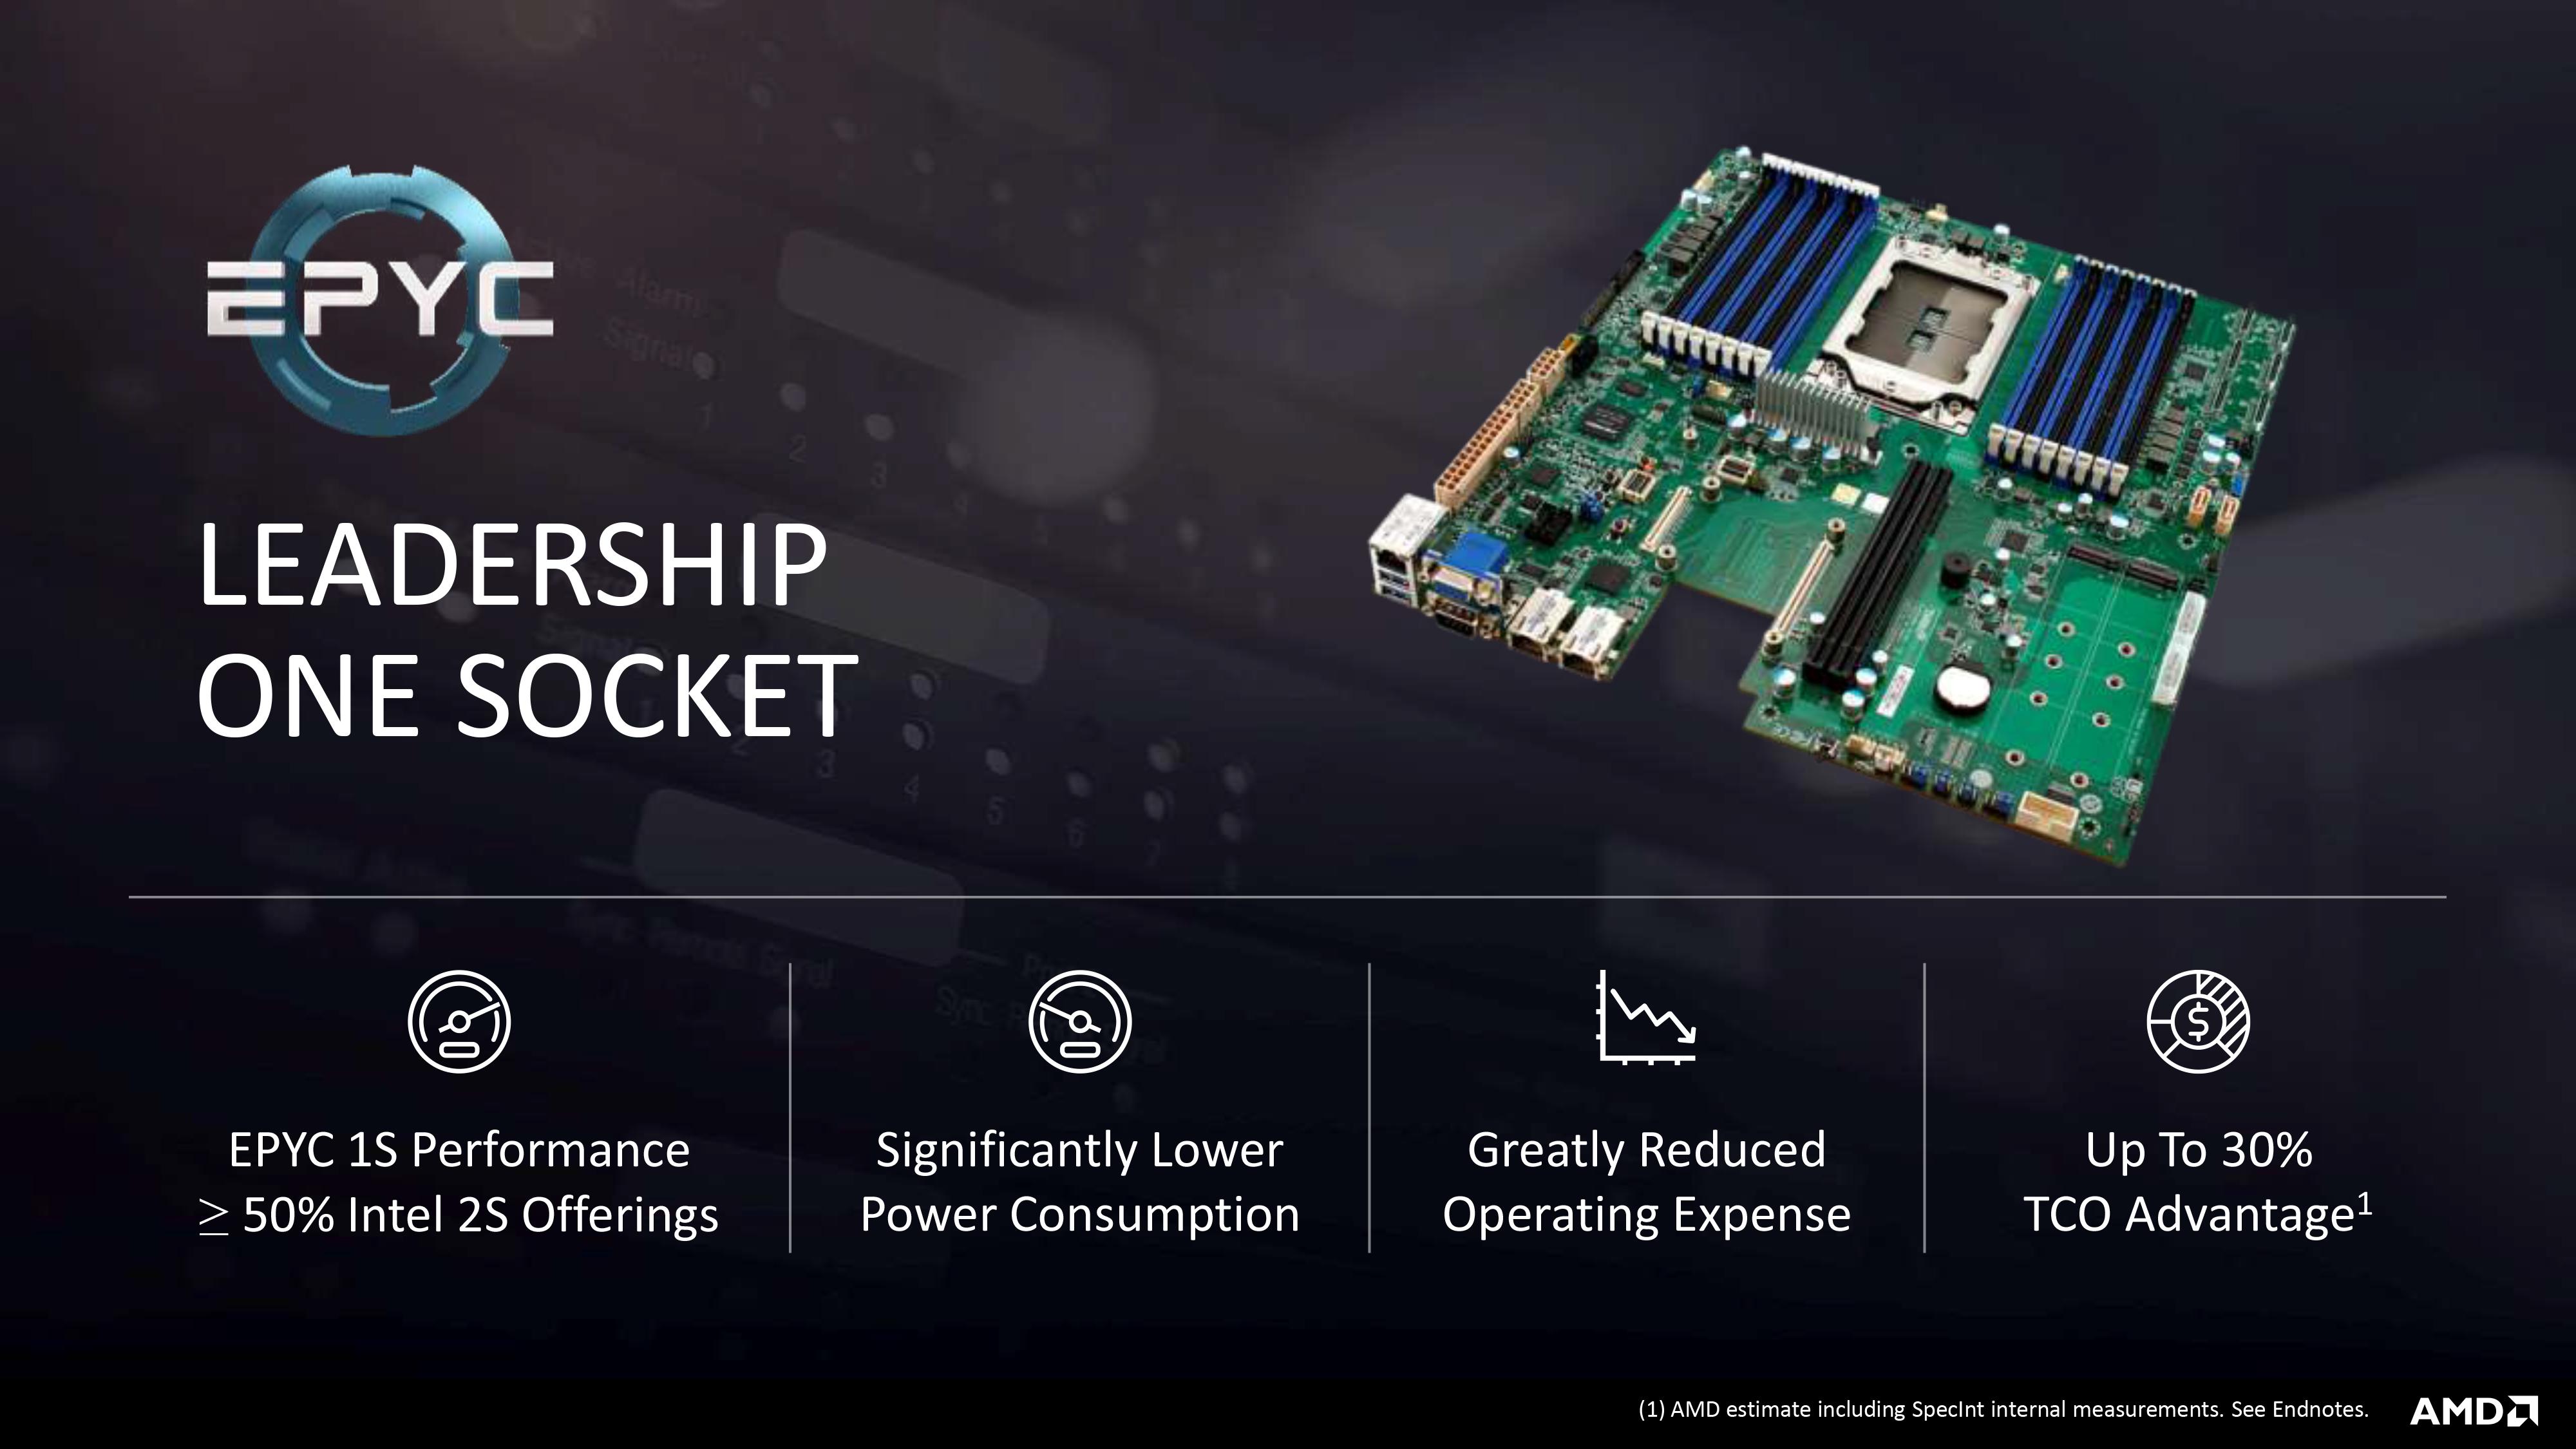 AMD CPU Updates: 16 Core ThreadRipper w/64 PCIe Lanes This